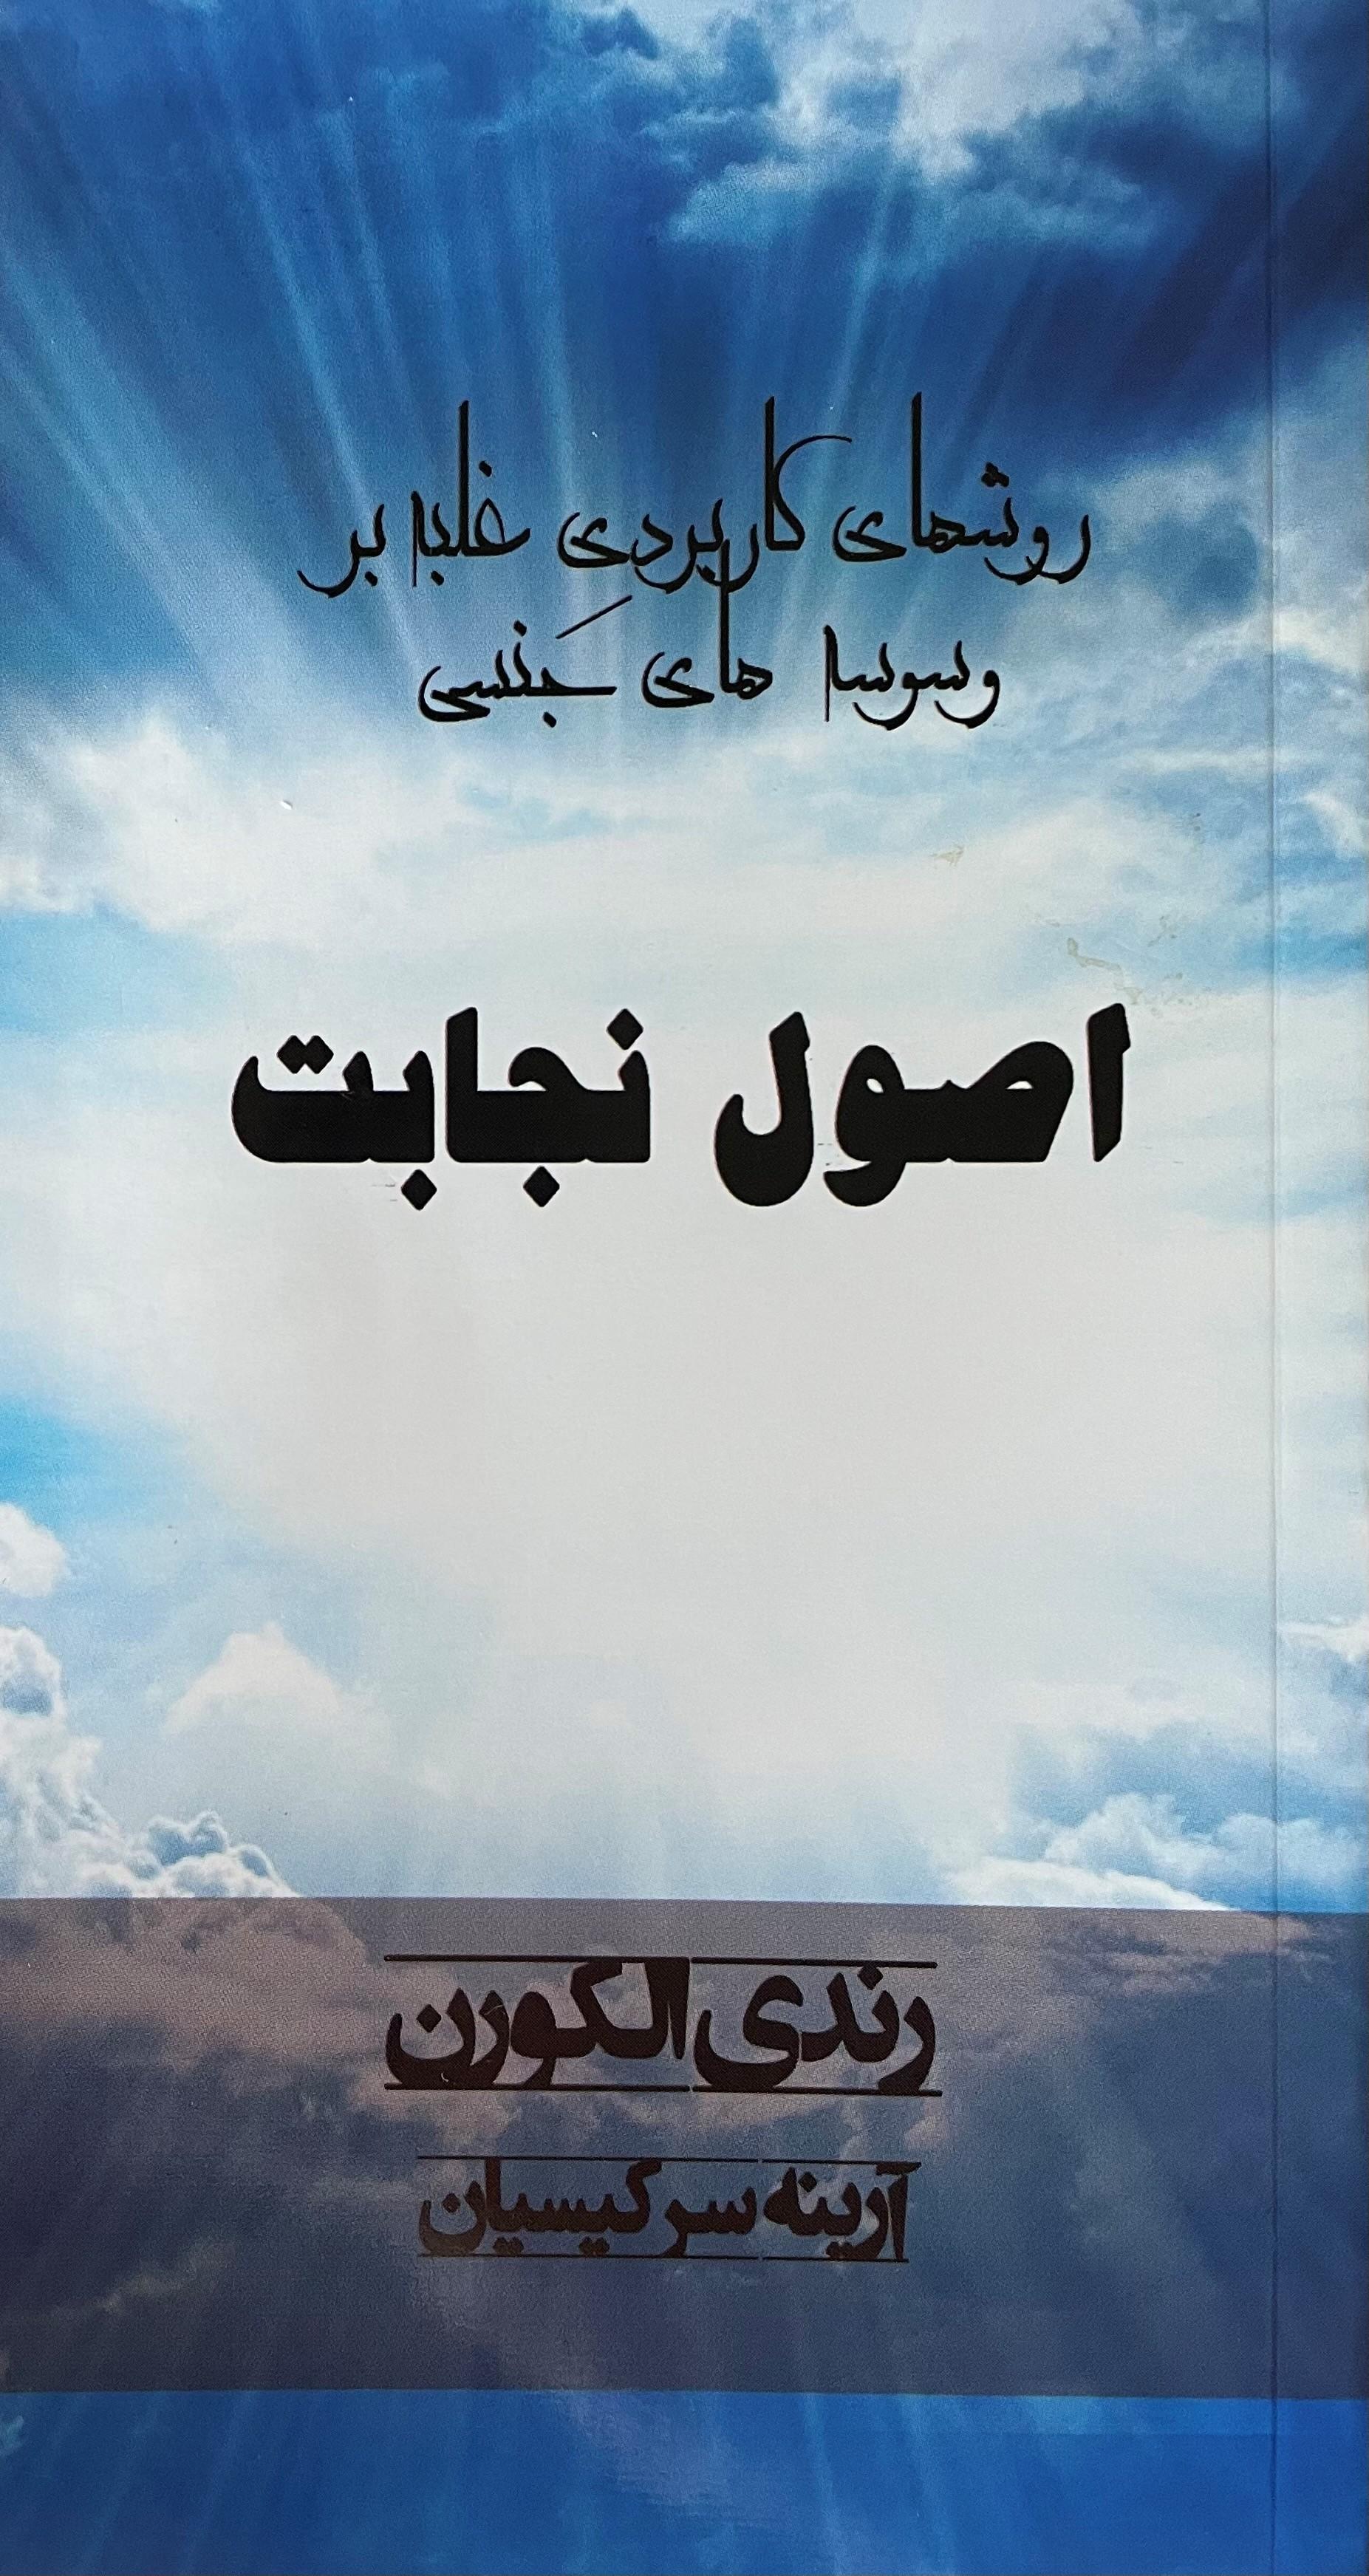 purity-principle-persian-farsi.jpg